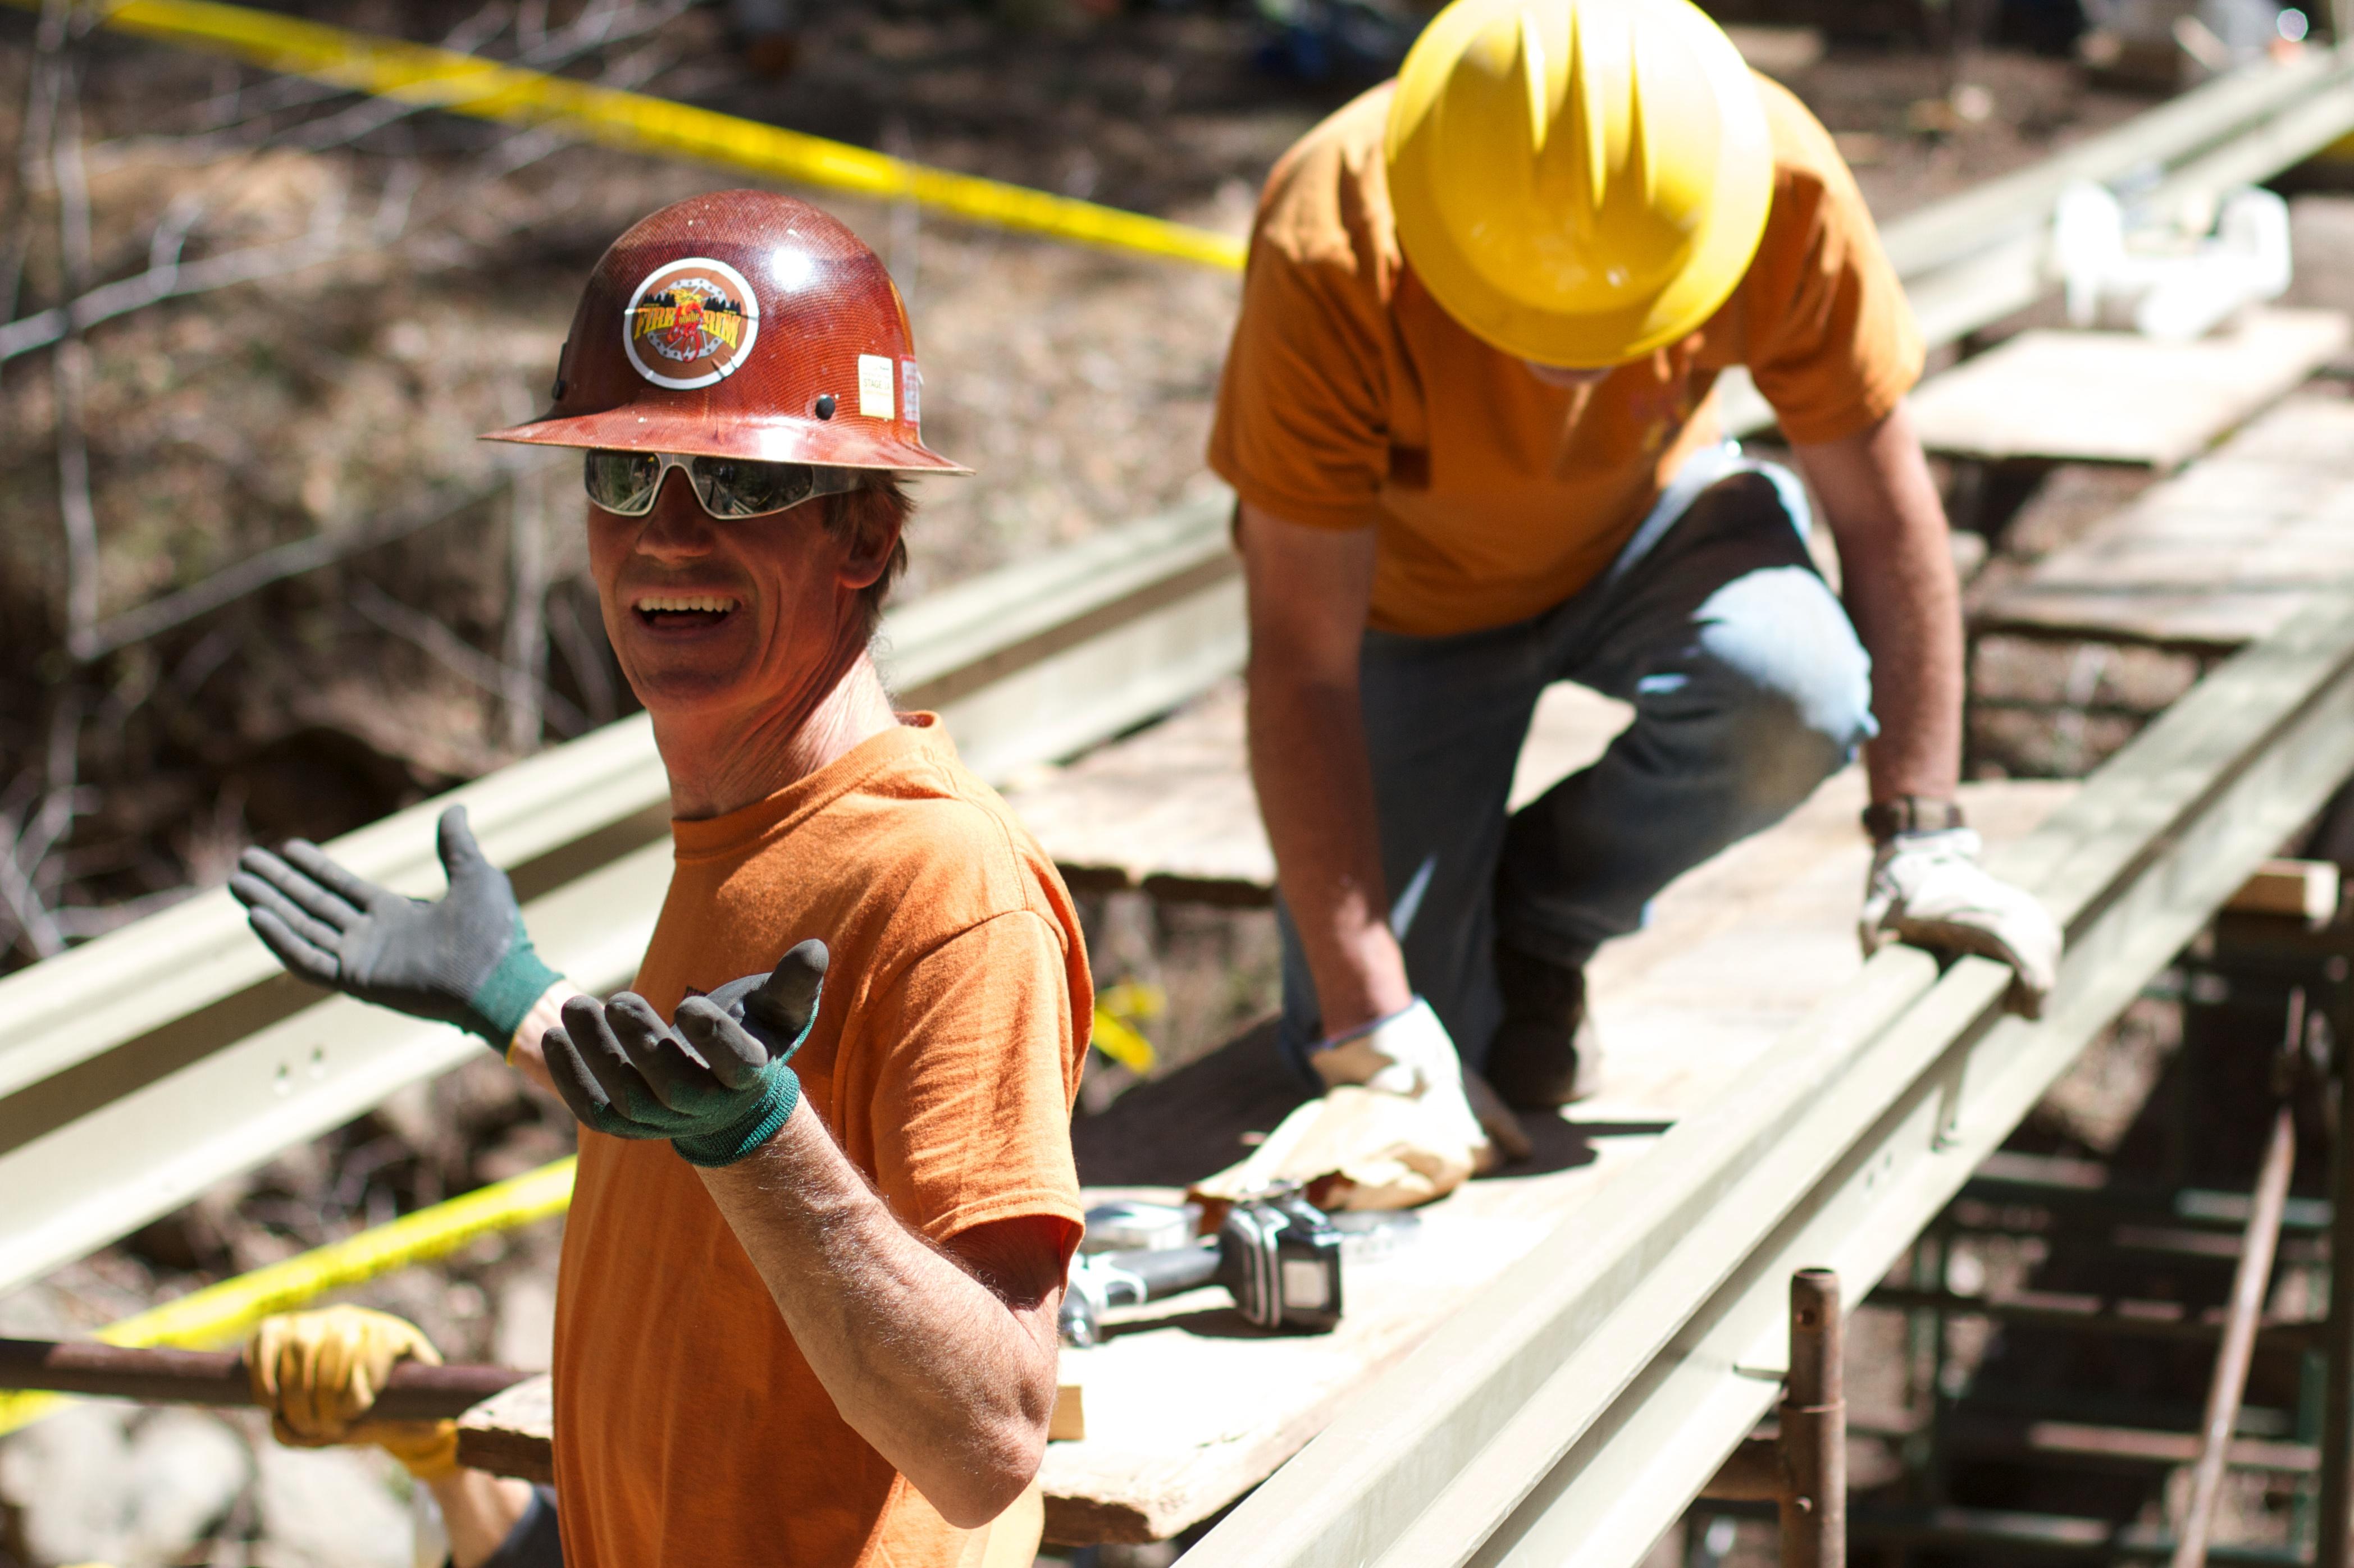 track pstrails laborer construction worker - Construction Laborer